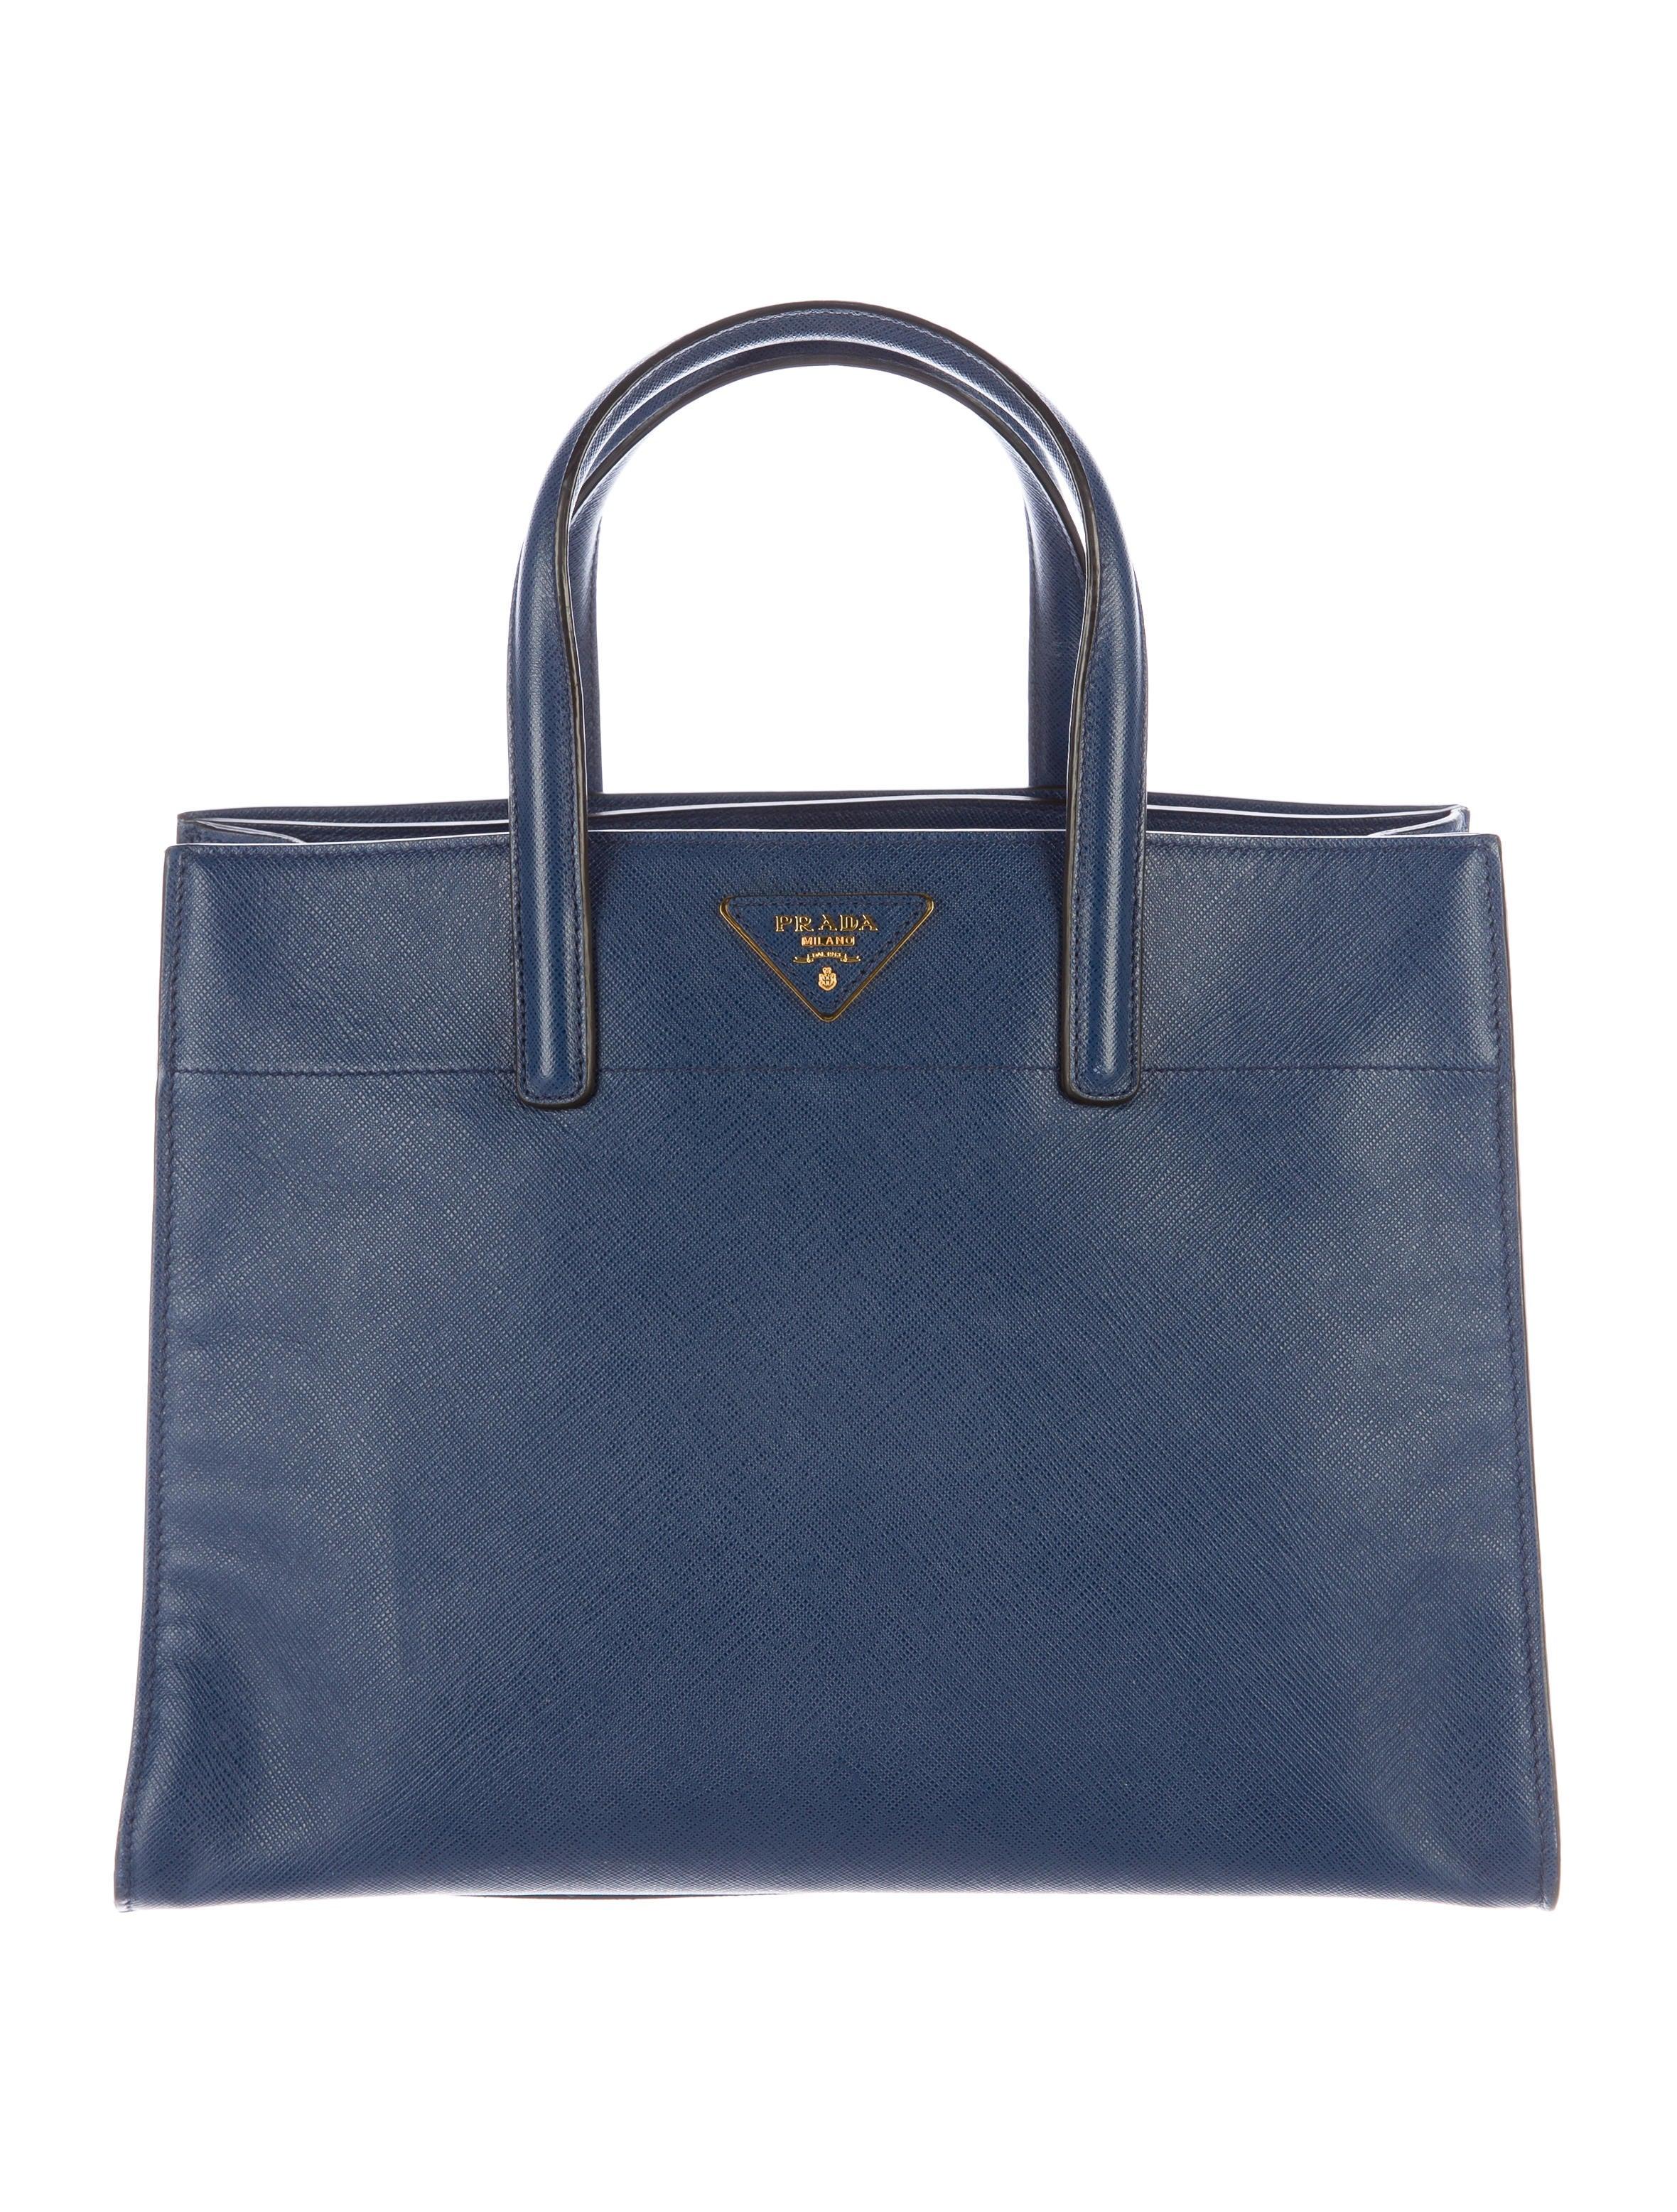 prada saffiano leather tote handbags pra141368 the